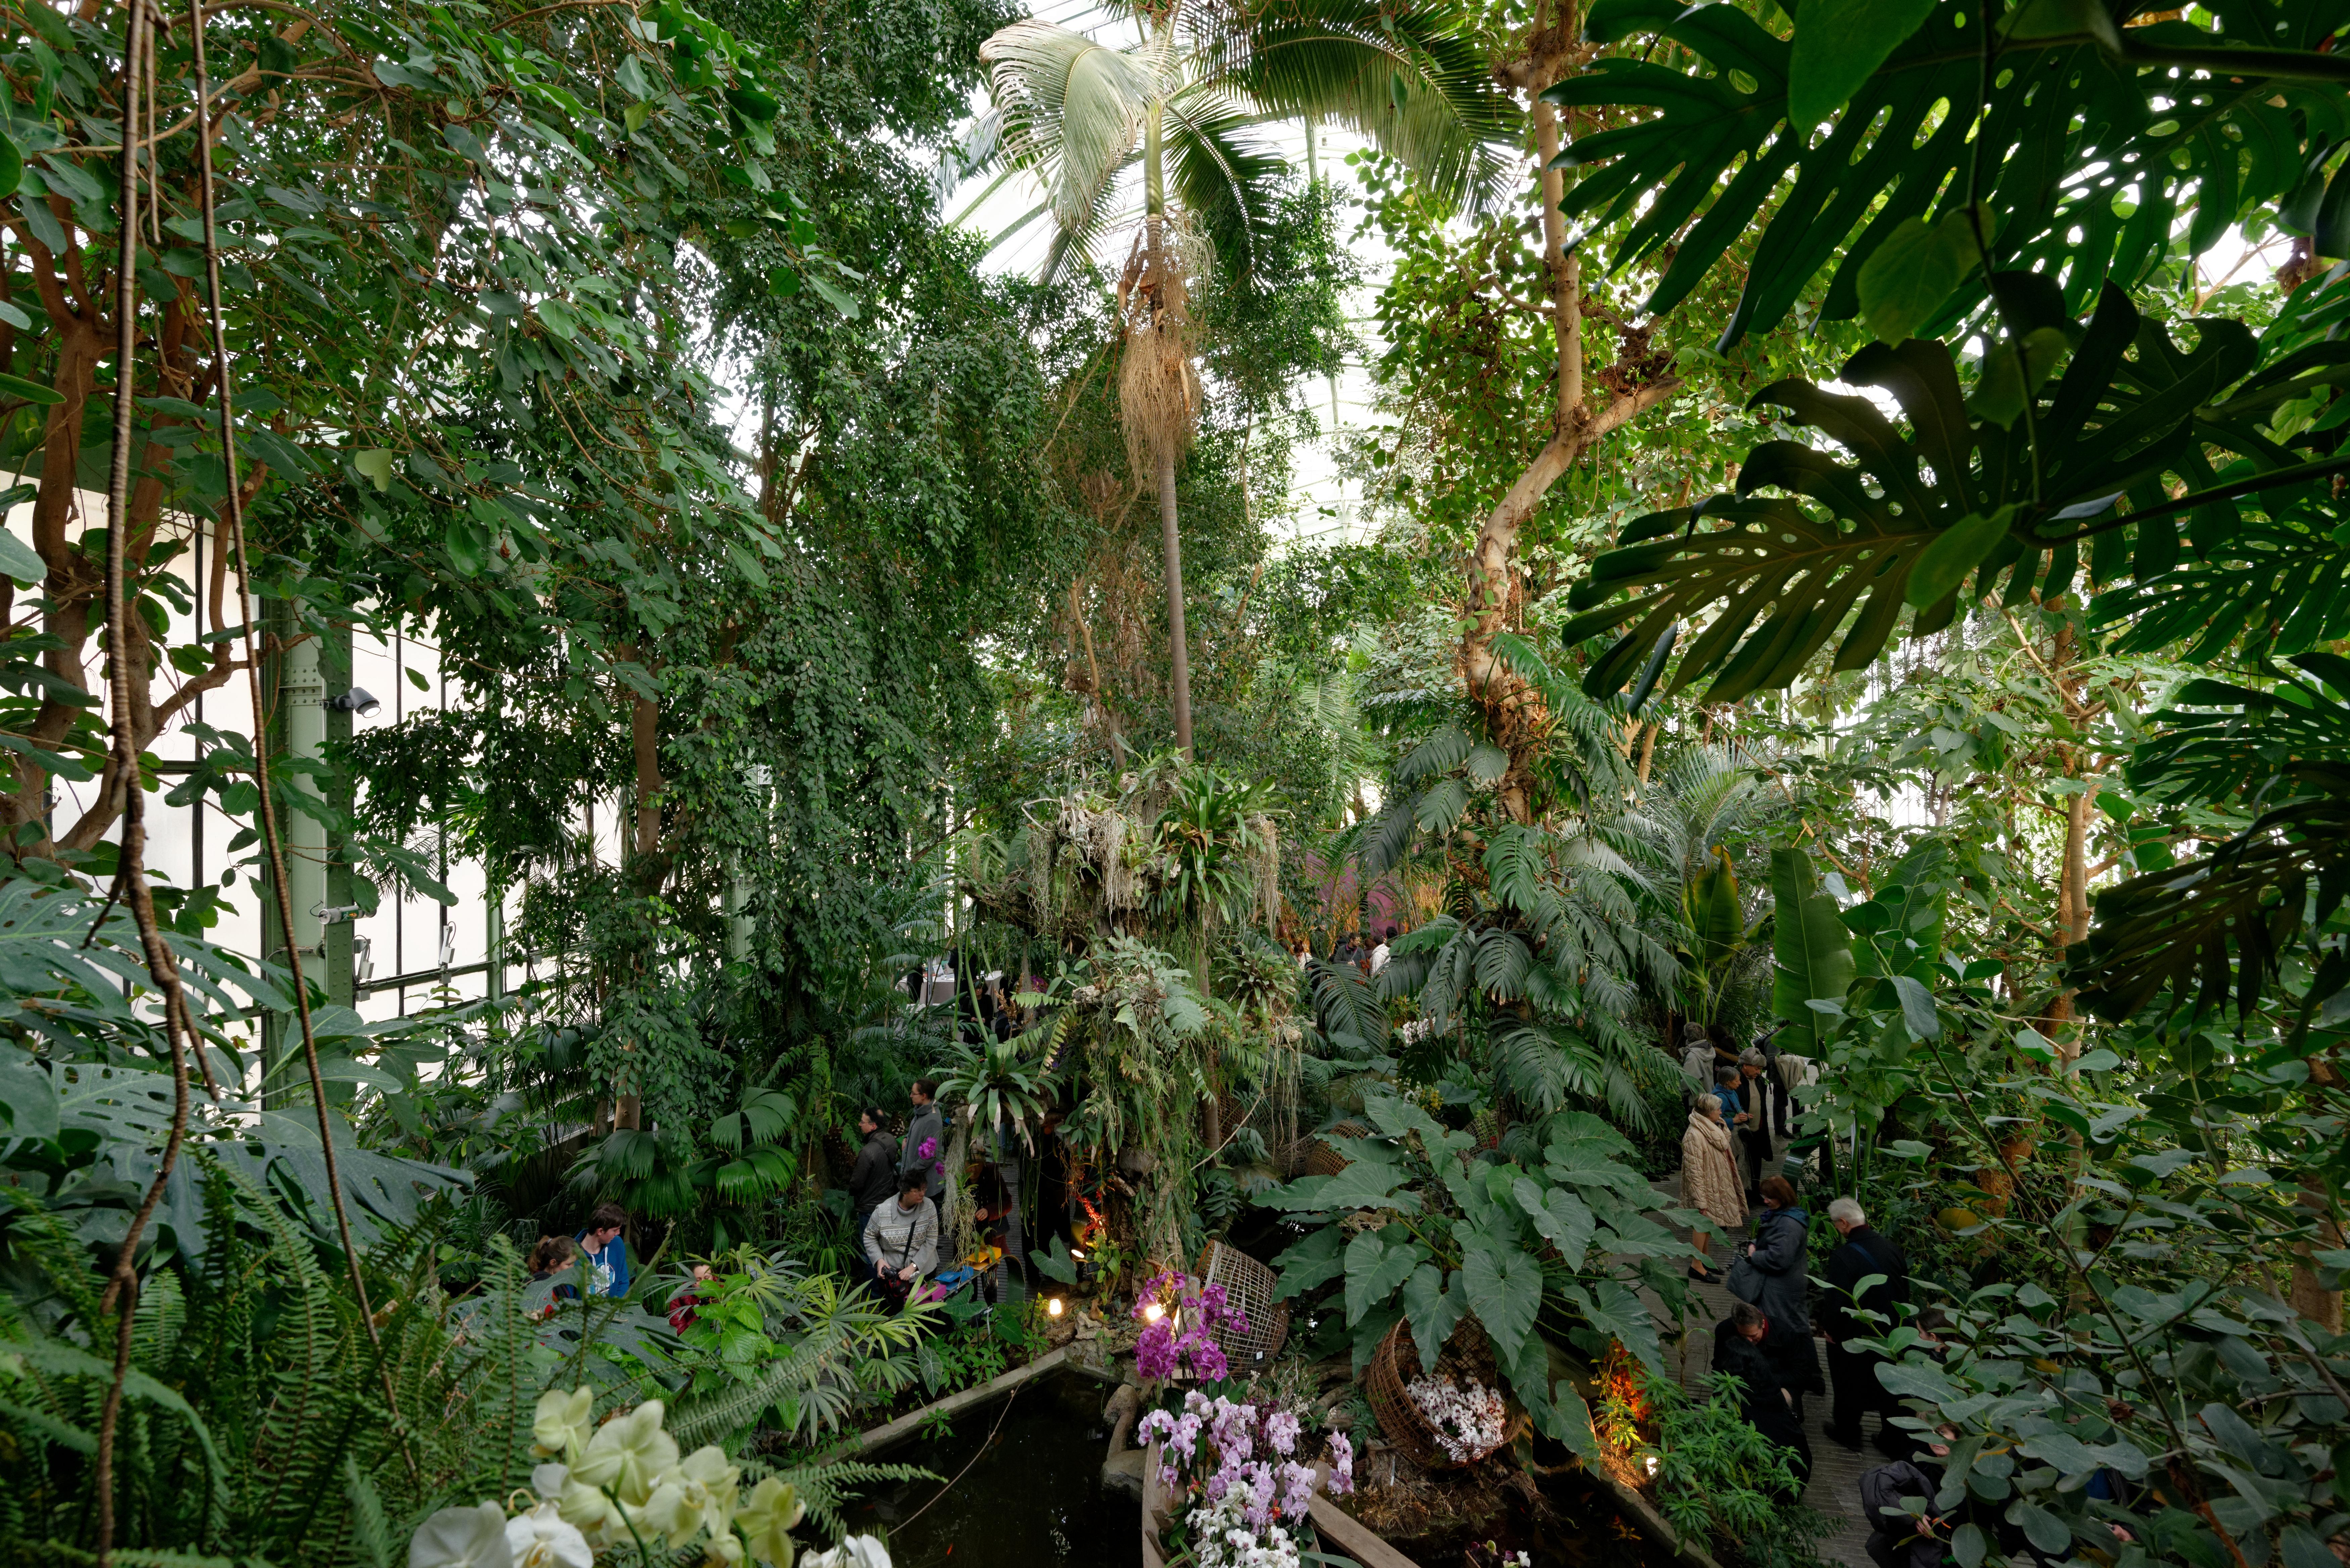 FileInterior main greenhouse Jardin des Plantes 2013 03 15 n02